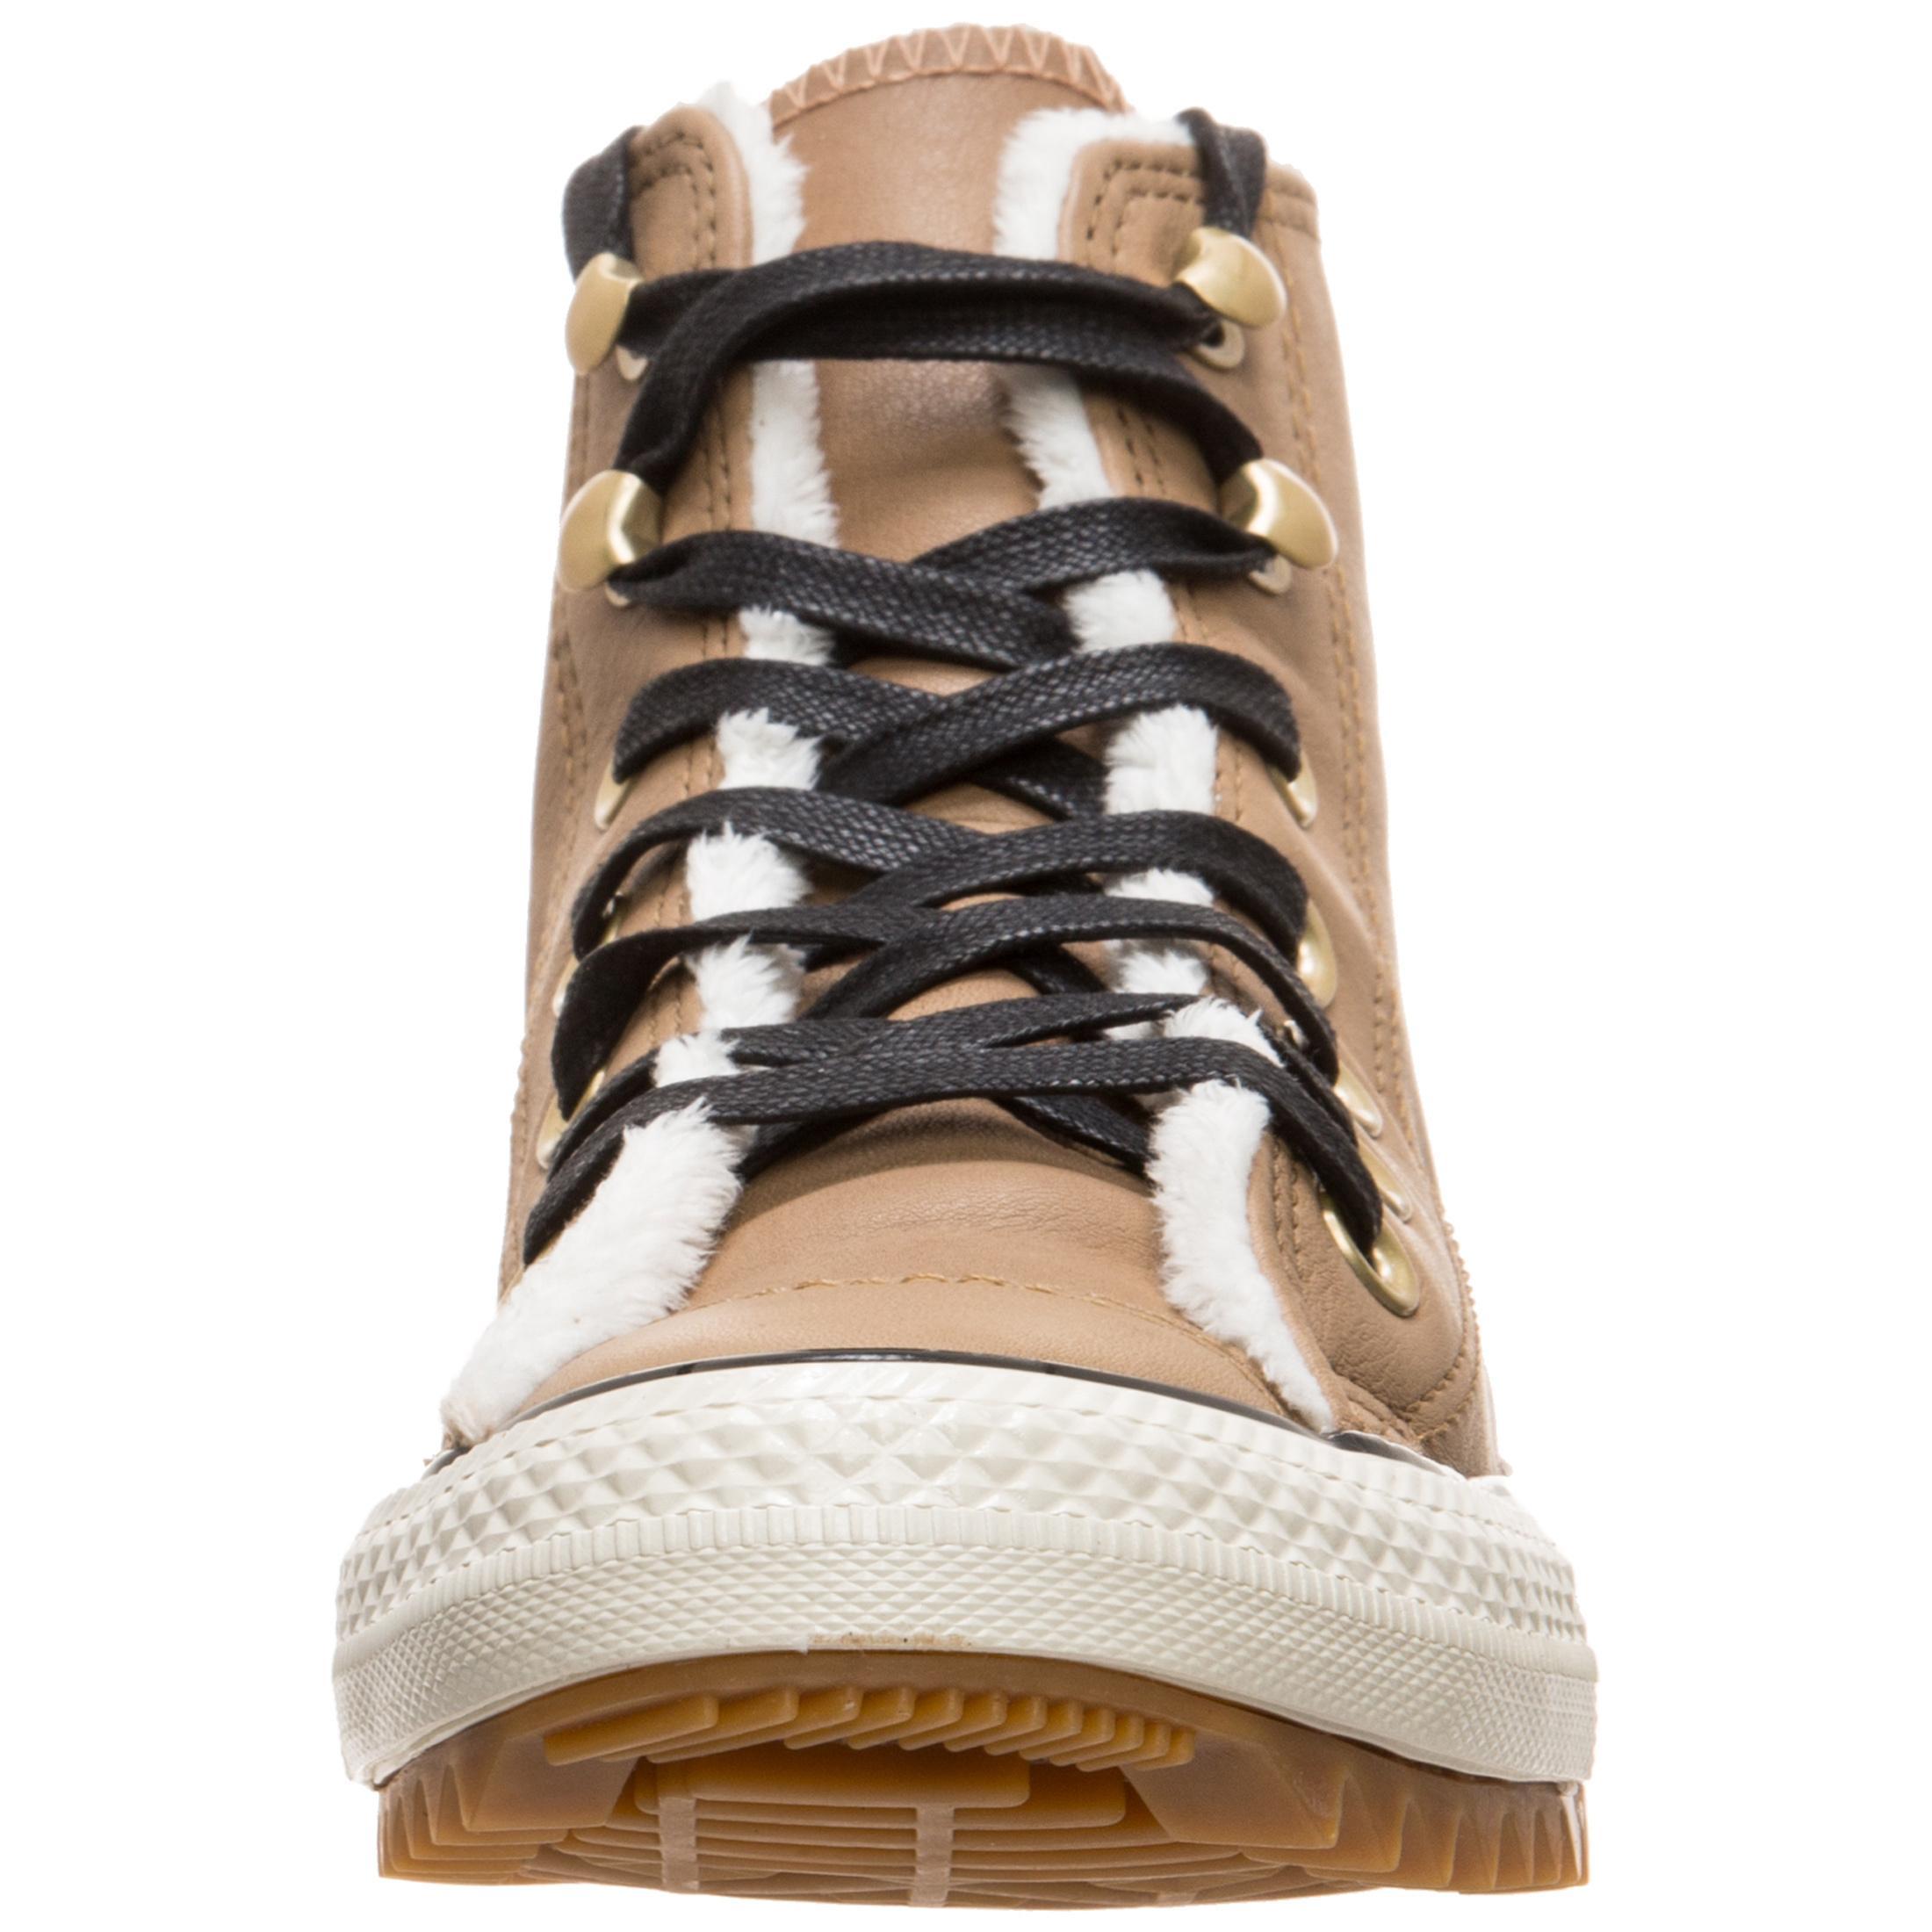 CONVERSE Chuck Taylor All Star Hiker Boots Herren hellbraun hellbraun hellbraun / weiß im Online Shop von SportScheck kaufen Gute Qualität beliebte Schuhe f073d2